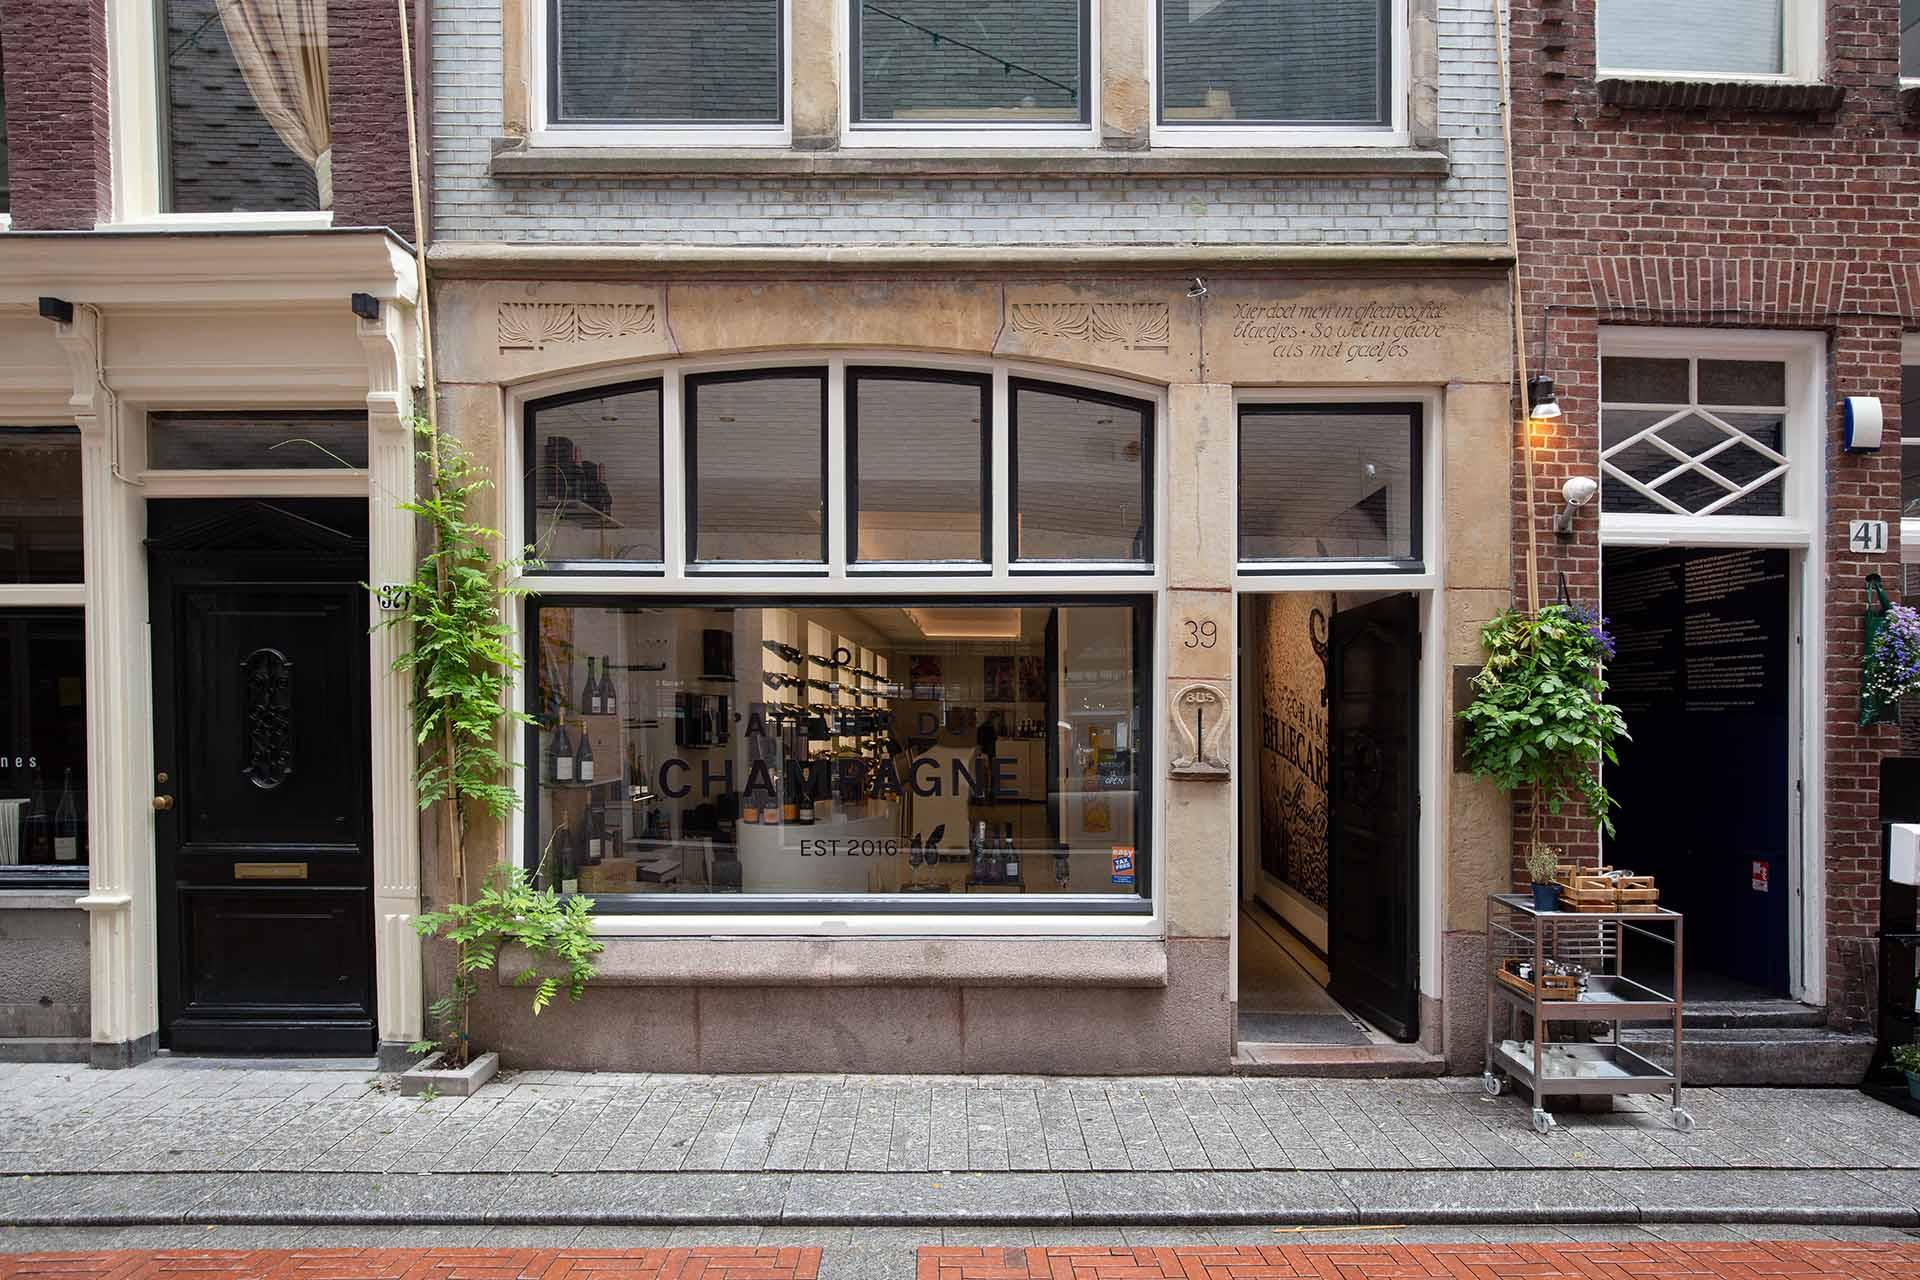 L'Atelier du Champagne, Amsterdam, NL (8)